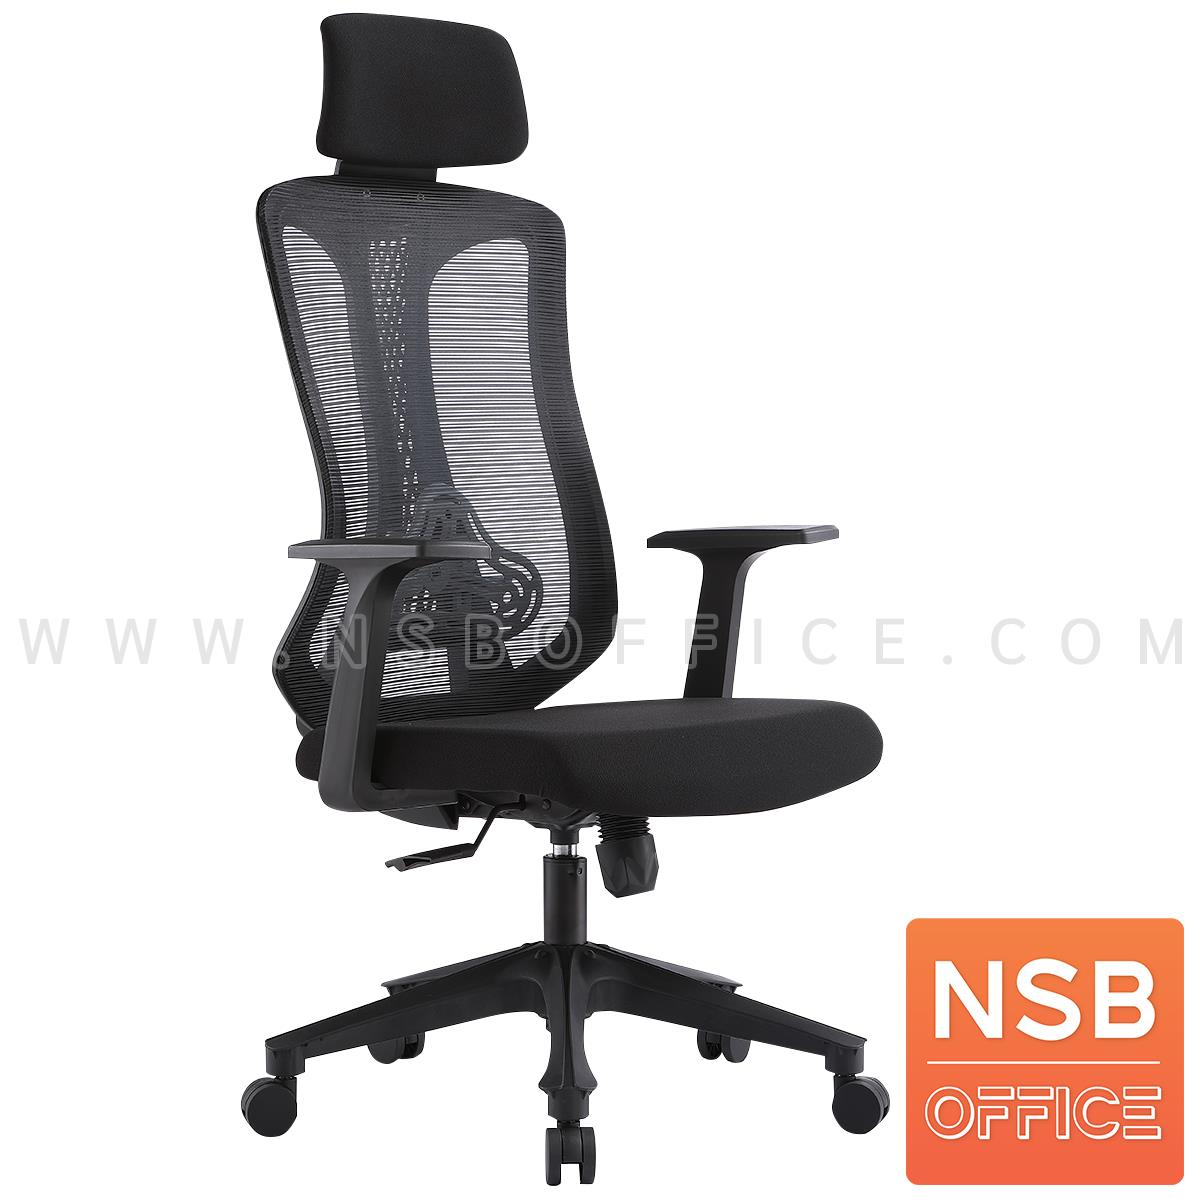 B28A134:เก้าอี้ผู้บริหารหลังเน็ต รุ่น Black Velvet (แบล็คเวลเวท)  โช๊คแก๊ส ก้อนโยก ขาพลาสติก